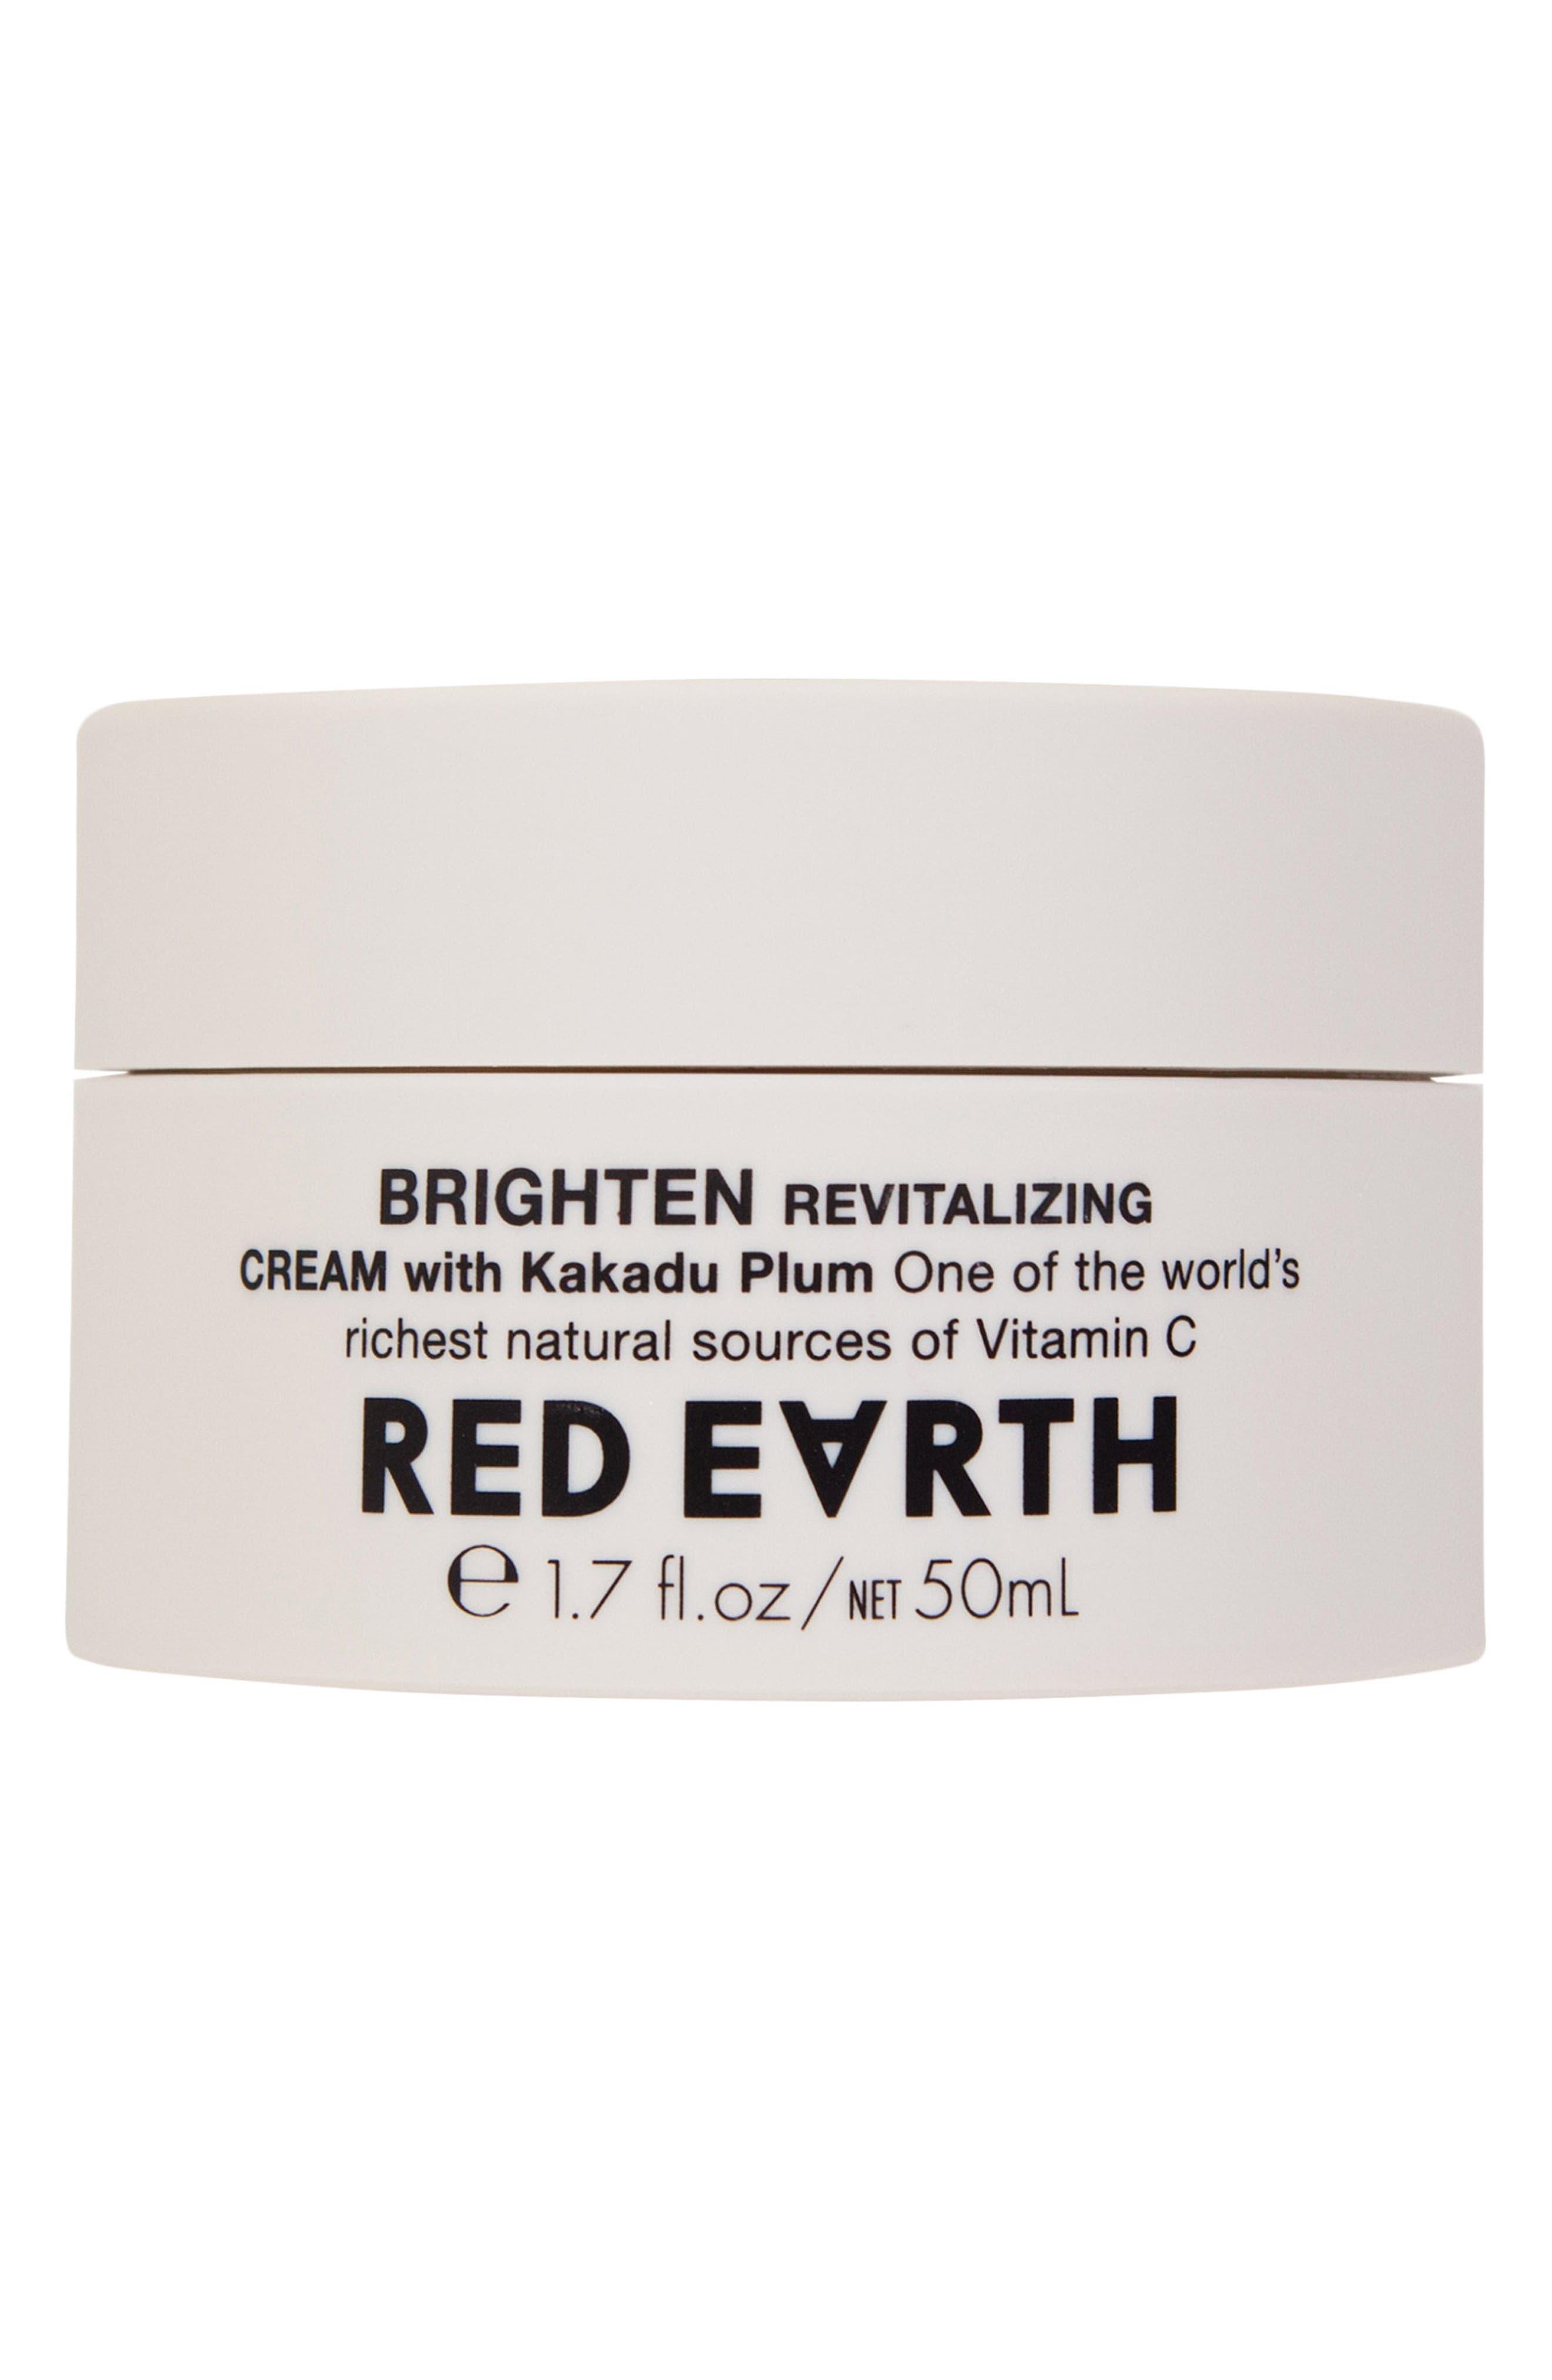 Red Earth Brighten Revitalizing Cream